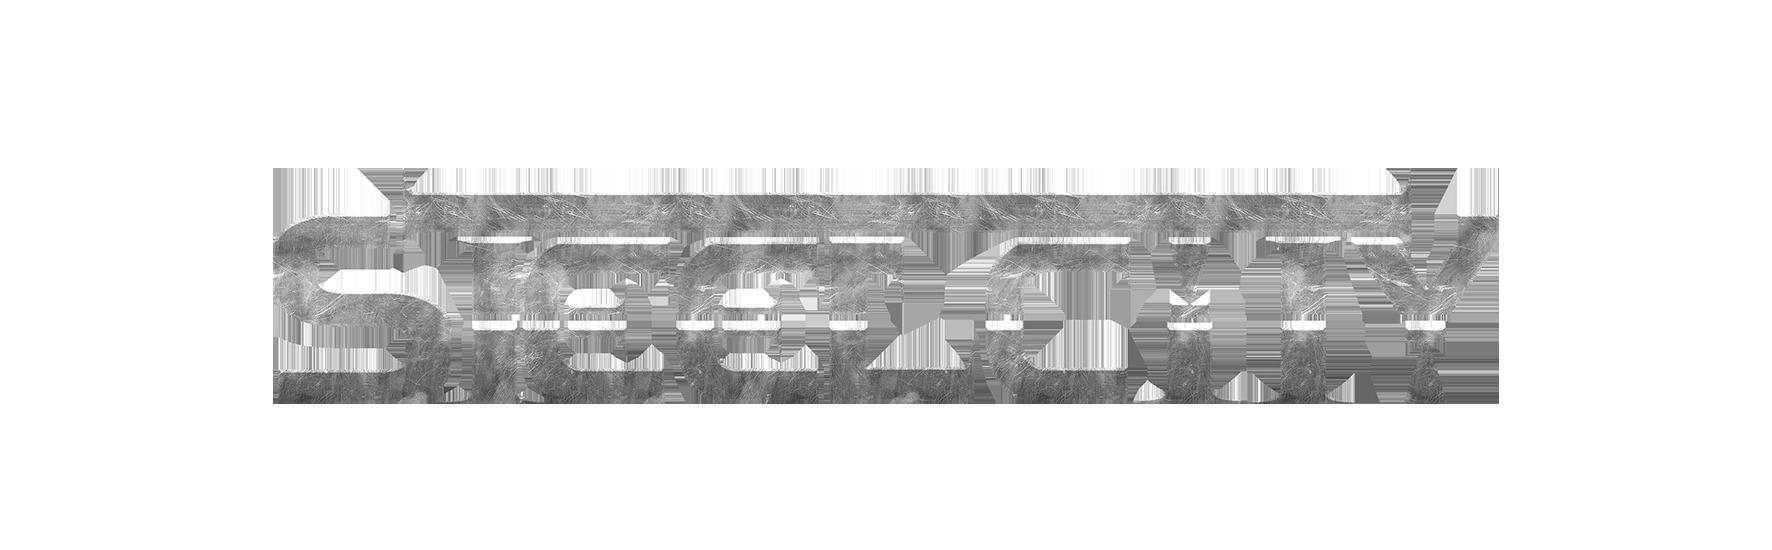 LOGO SteelCity